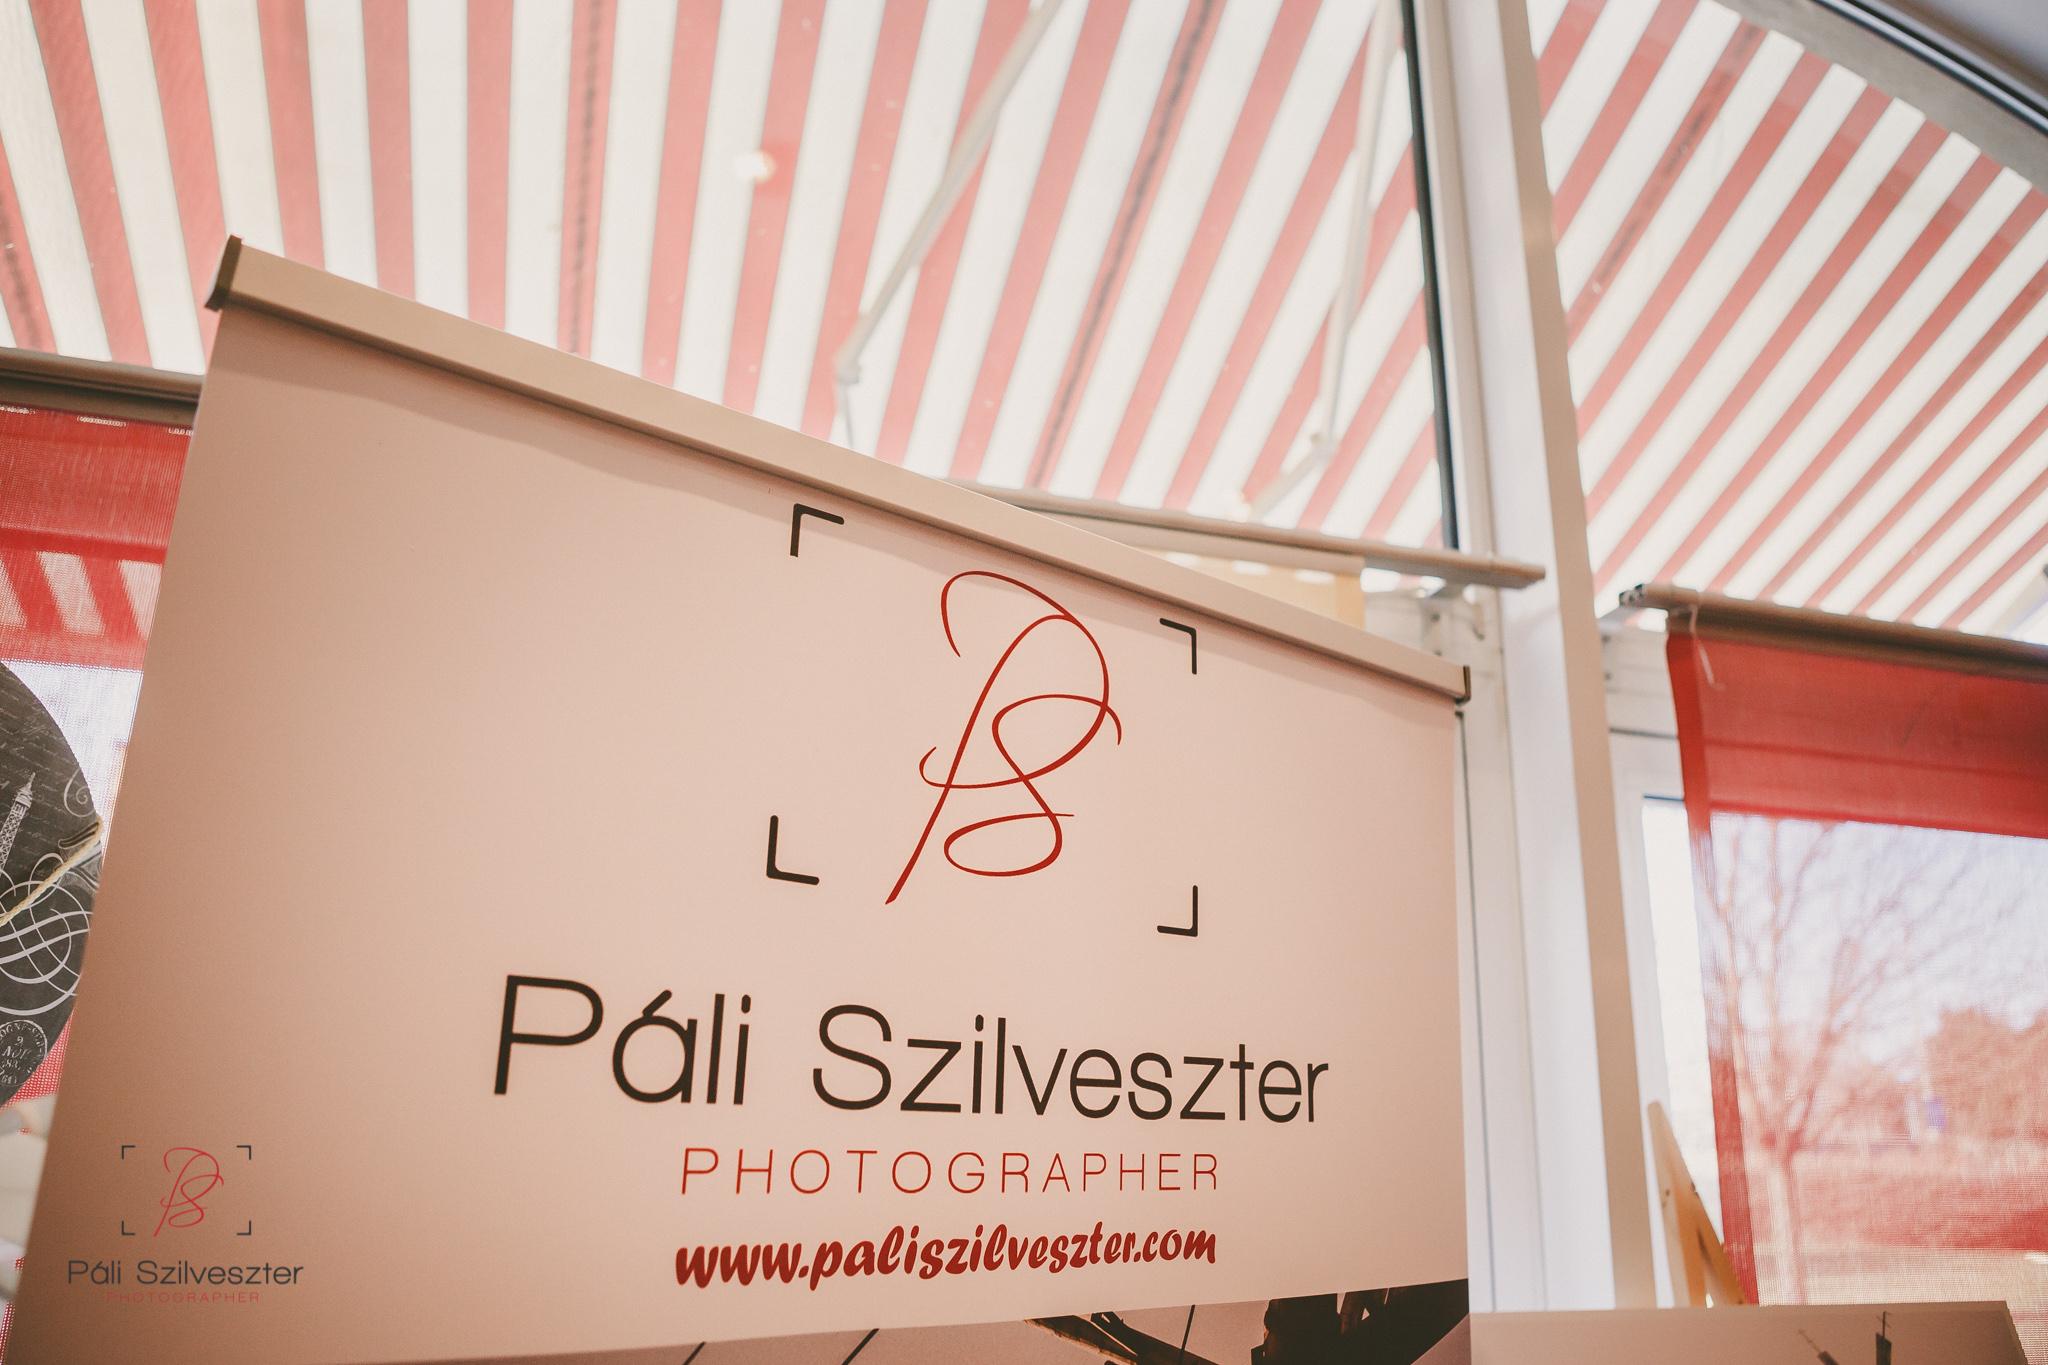 Pali-Szilveszter-szekesfehervari-eskuvoi-fotos-novotel-eskuvokiallitas-20160116-1238.jpg